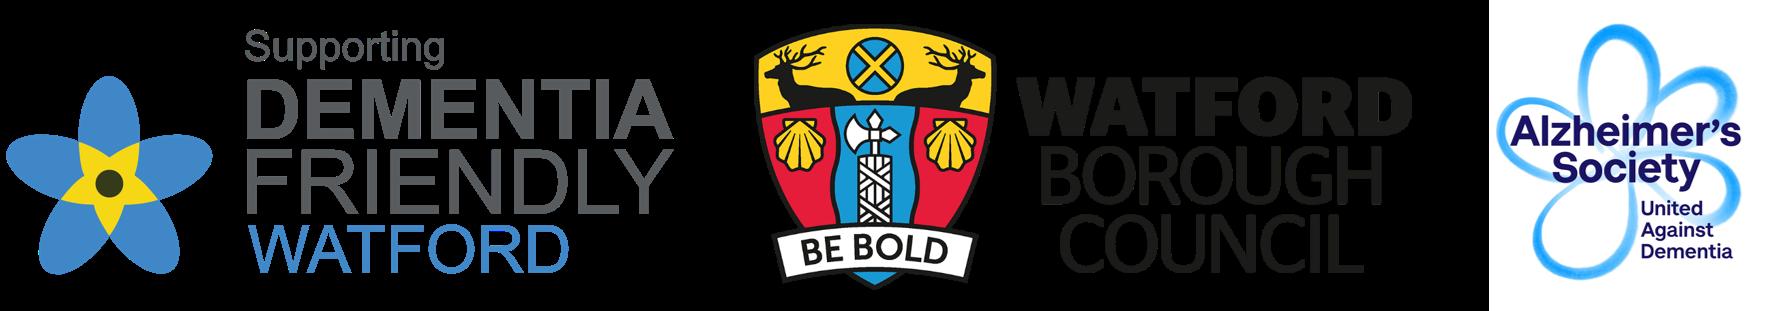 Logos of Dementia Friendly Watford, Watford Boroug